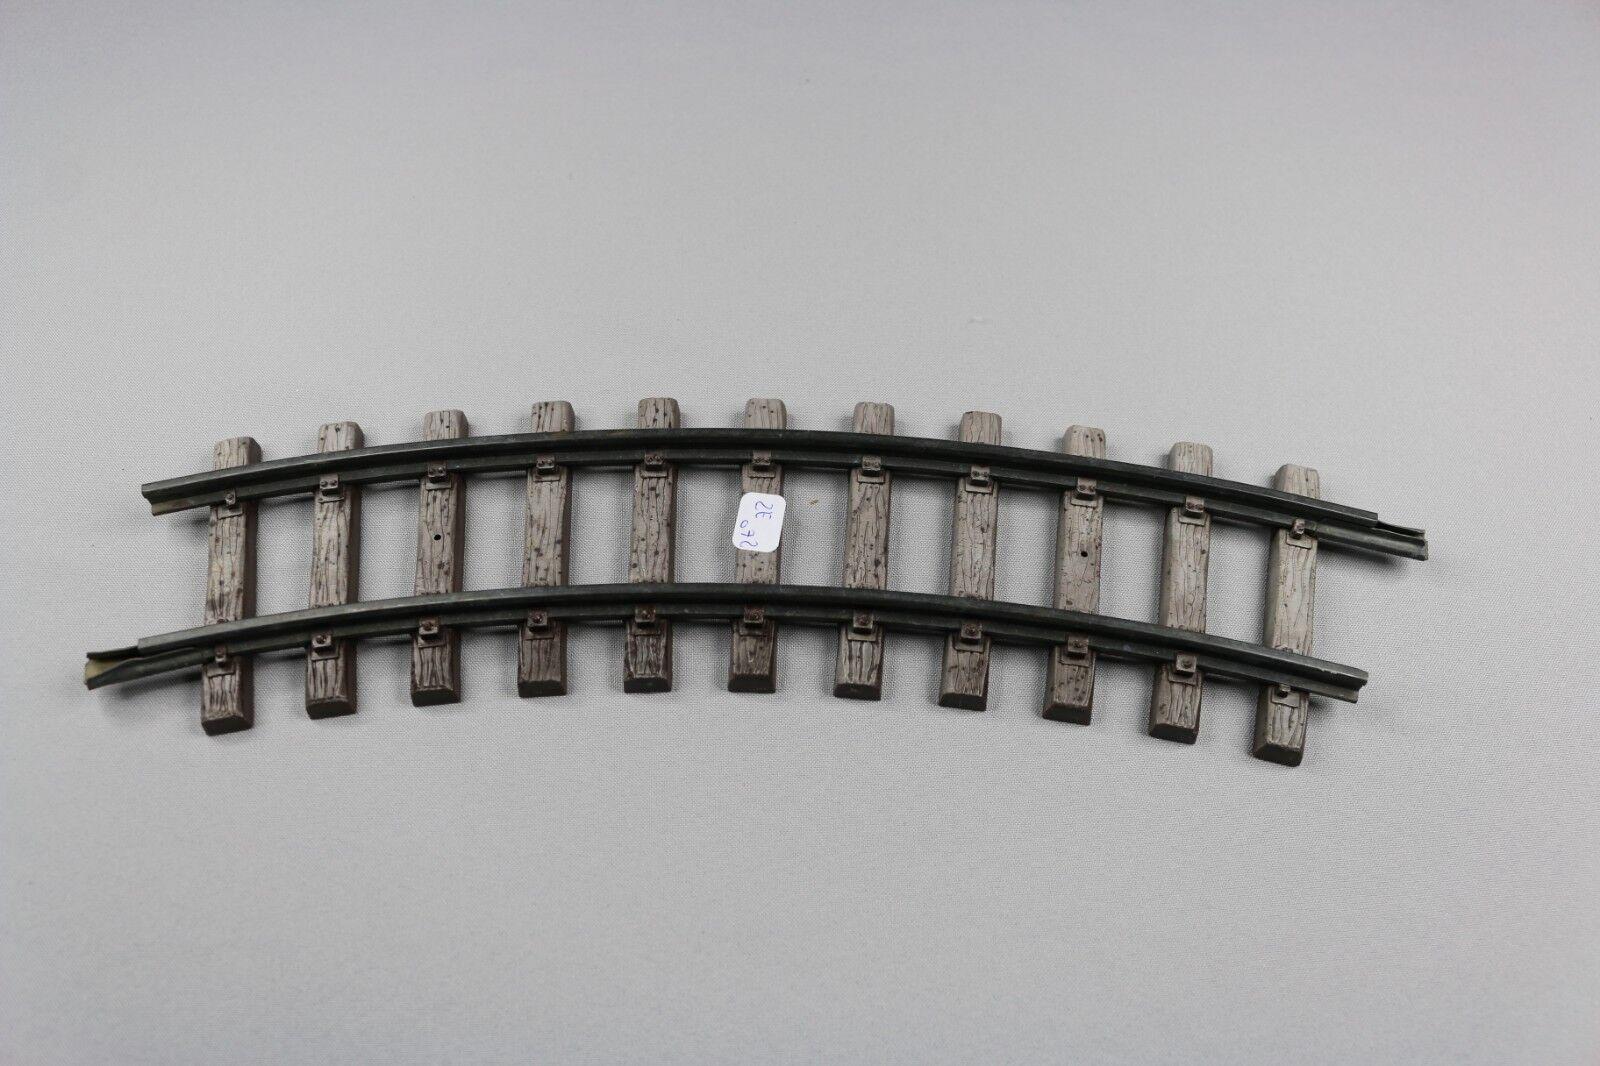 LGB LEHMANN Piste G 1100 Courbé rails R = 600 mm